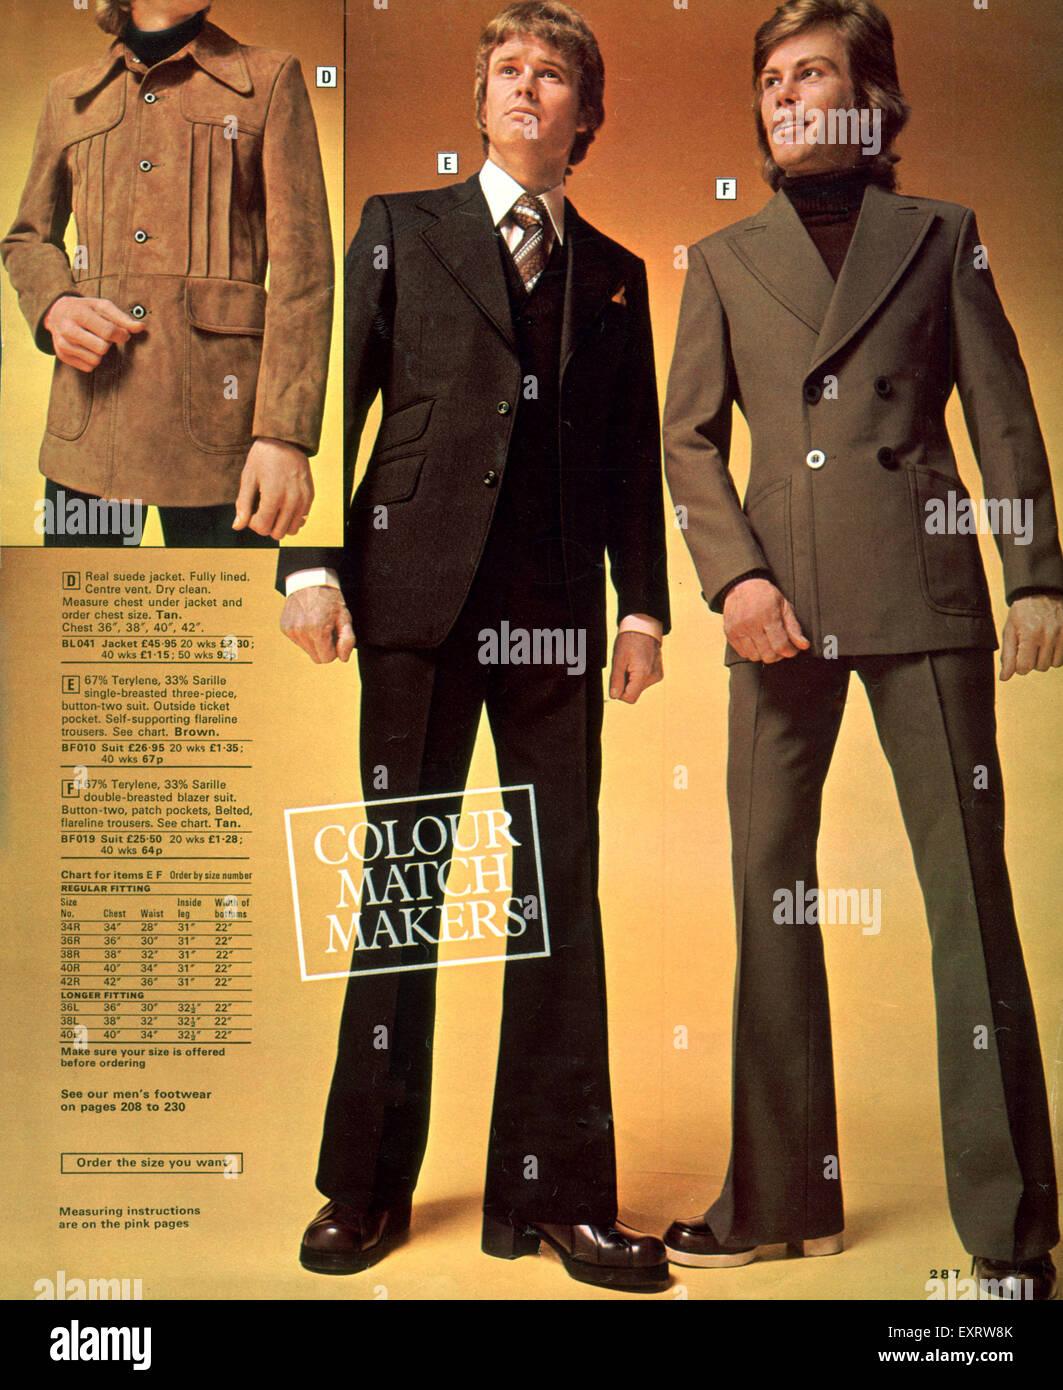 1970s Uk Mens Fashion Catalogue Stock Photos & 1970s Uk ...